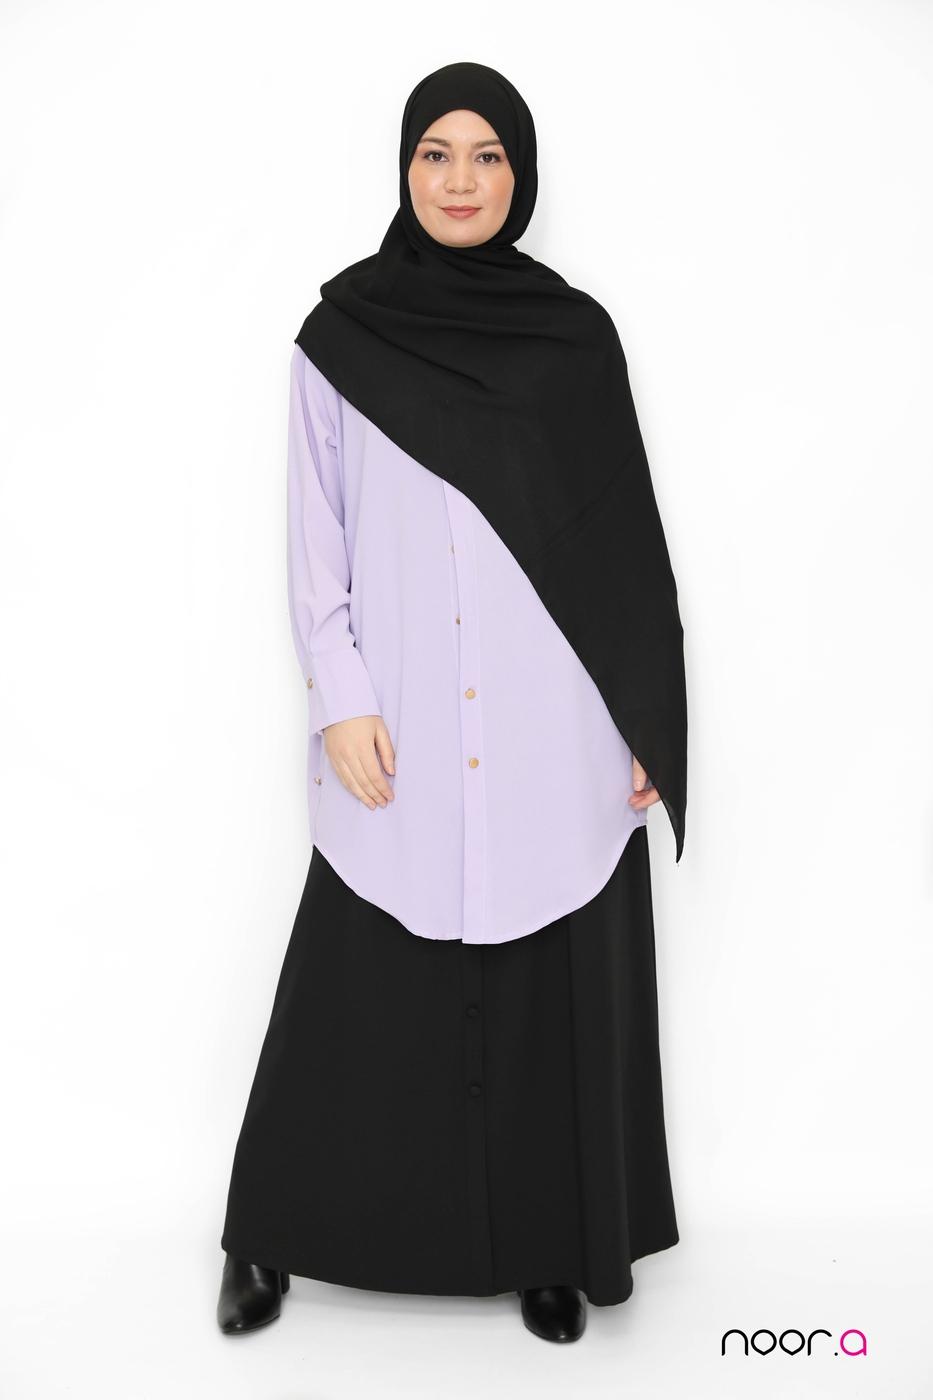 jupe-évasée-noire-chemise-oversize-lila-hijab-jazz-noir